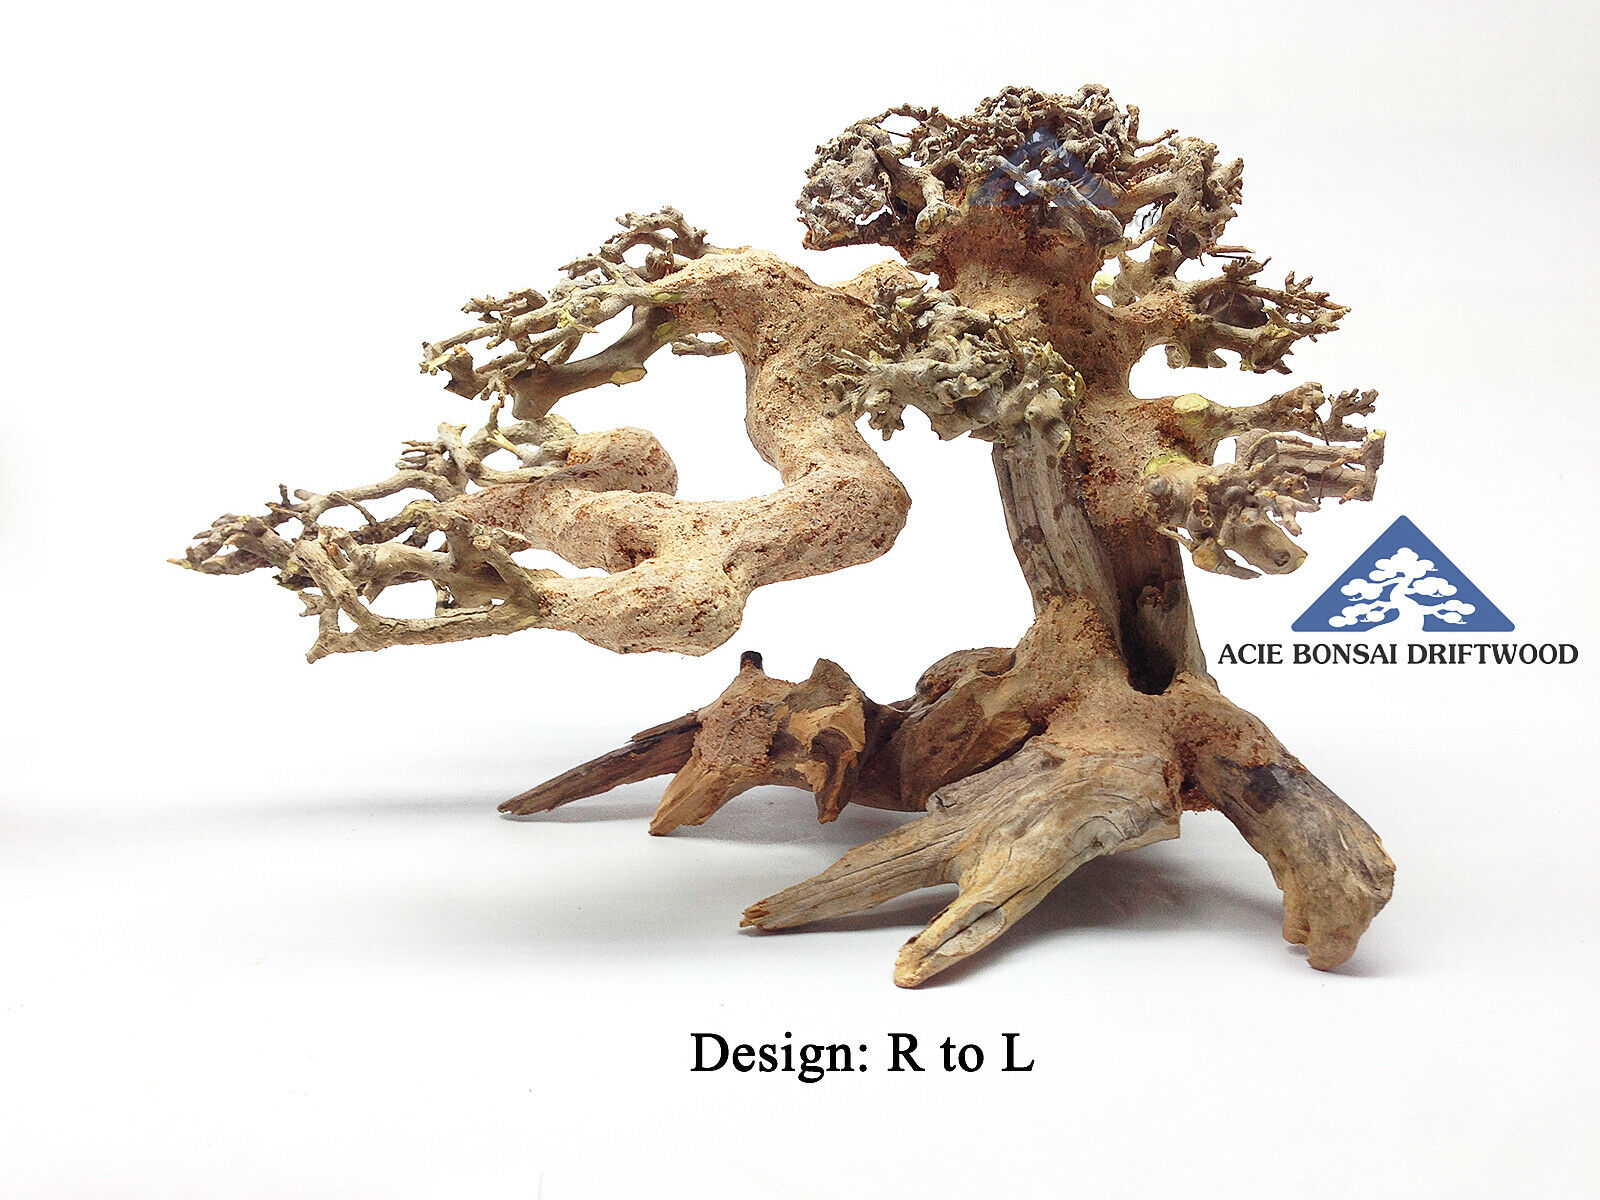 (International) Medium Bonsai Driftwood Natural Aqua Decor Make to Order Order Order - RL4 798edd